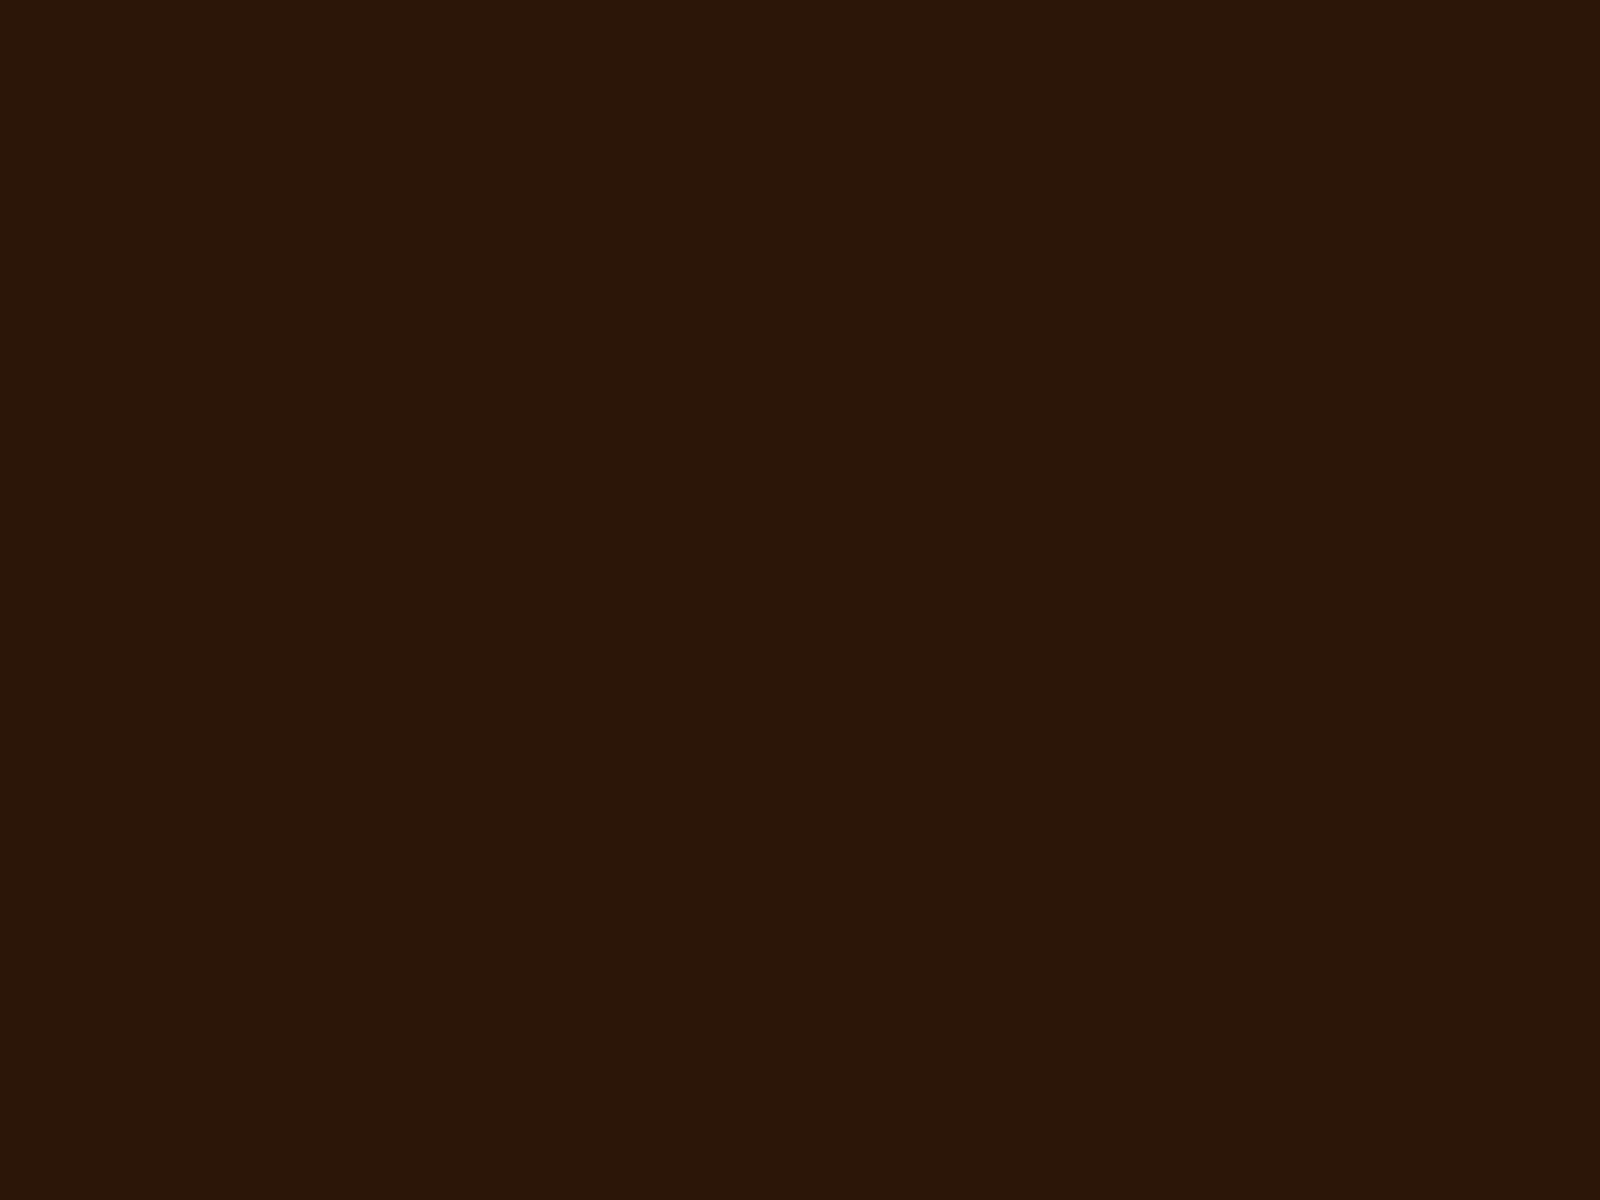 1600x1200 Zinnwaldite Brown Solid Color Background